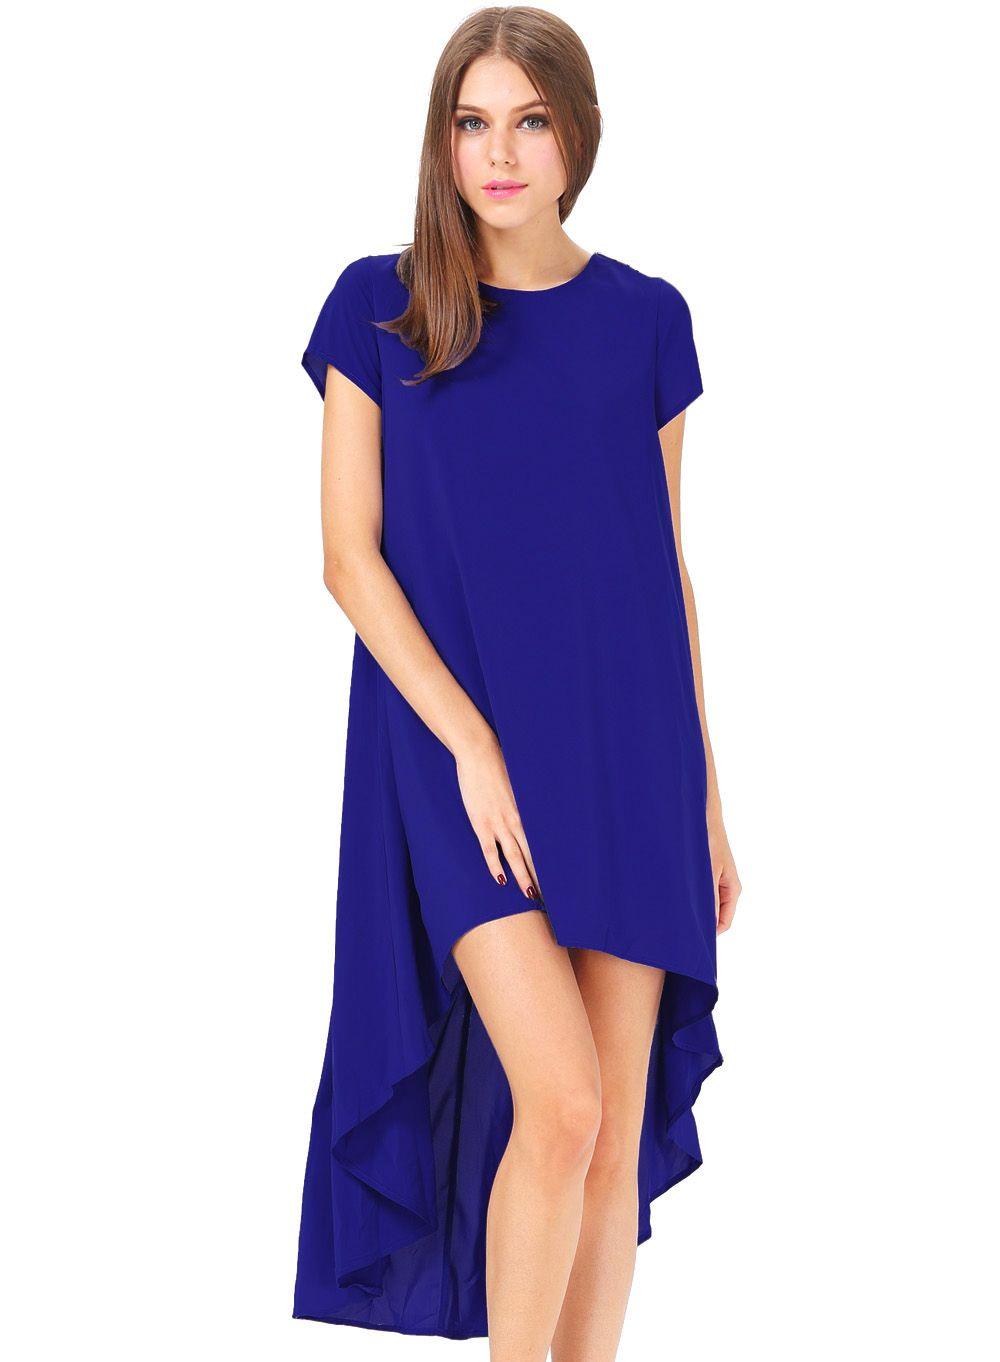 Vestido asimétrico mangas cortas-Azul 17.59 | Dresses | Pinterest ...